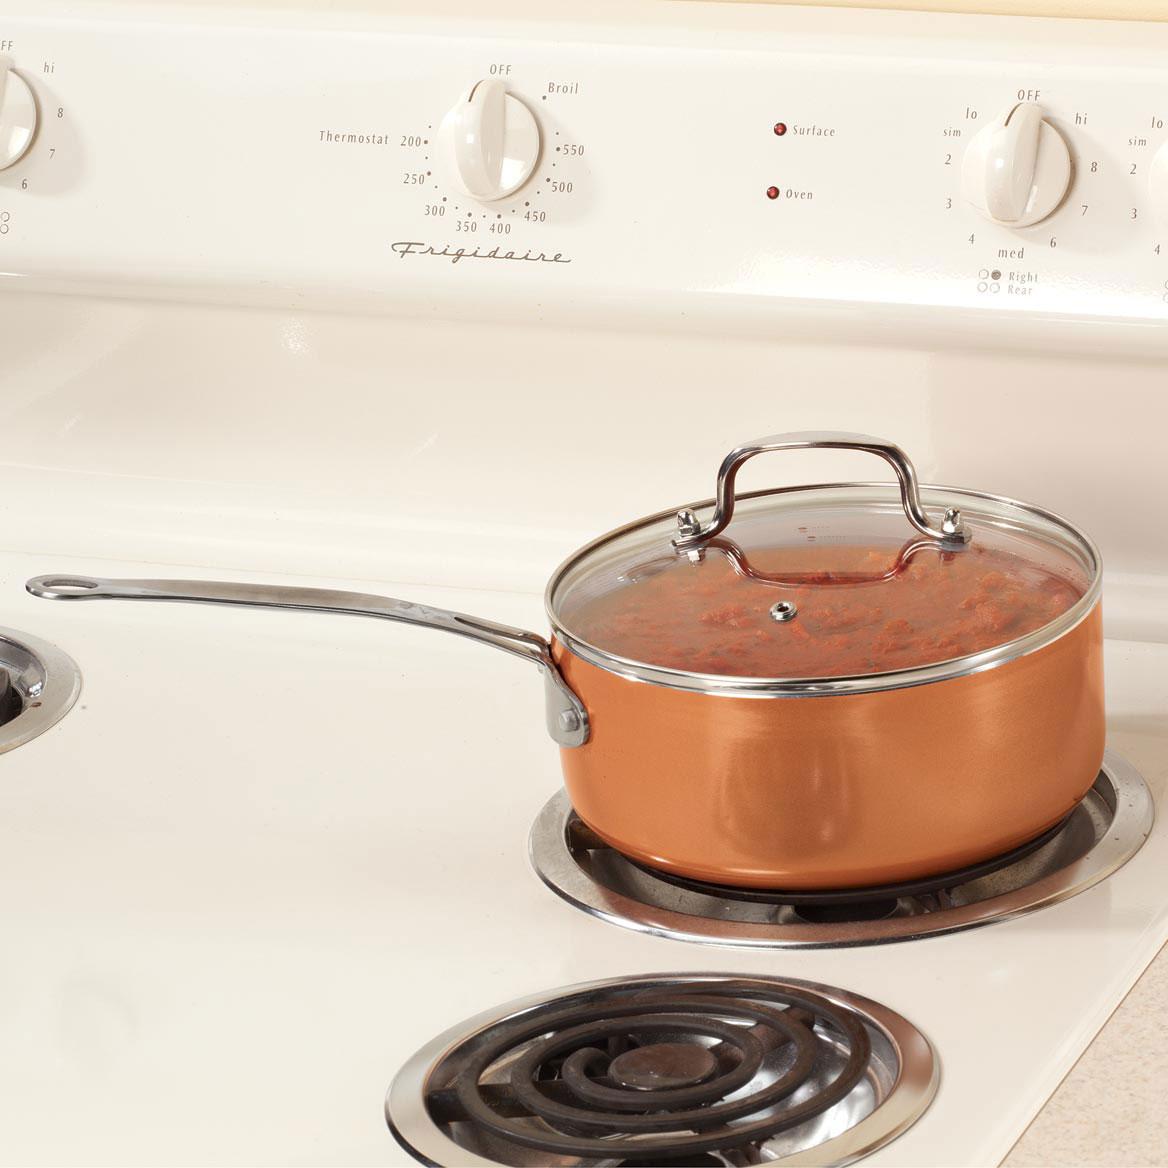 Ceramic Non Stick Sauce Pan With Lid 3 Qt 840853190530 Ebay